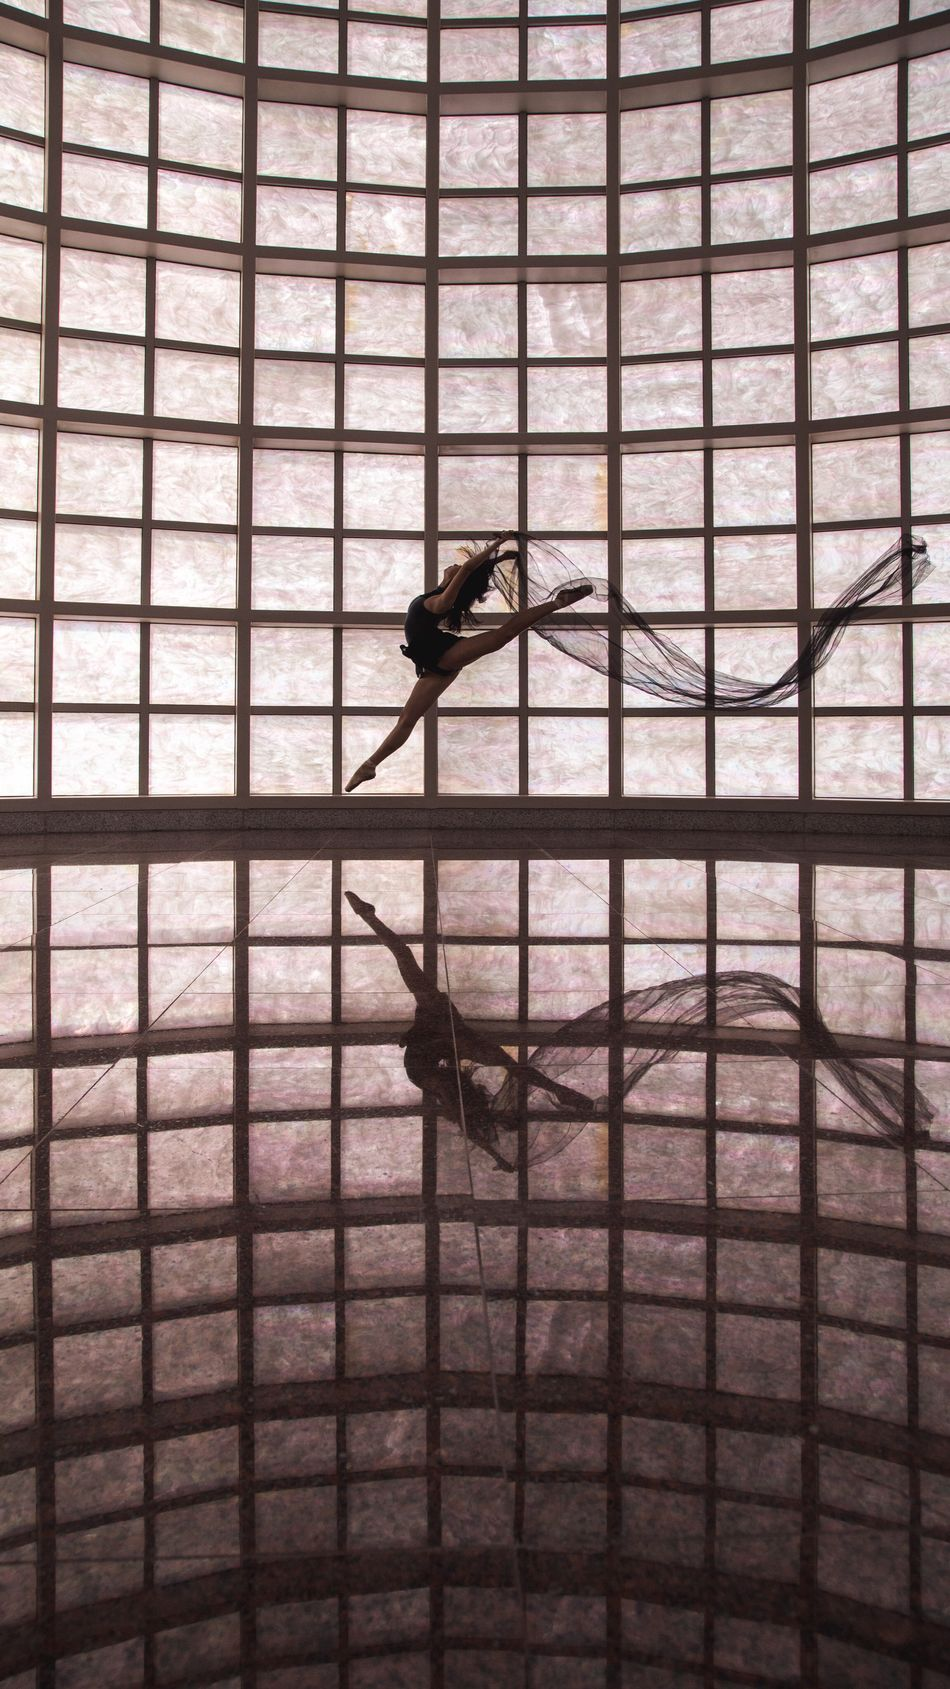 Beautiful stock photos of tanz, window, pattern, indoors, silhouette